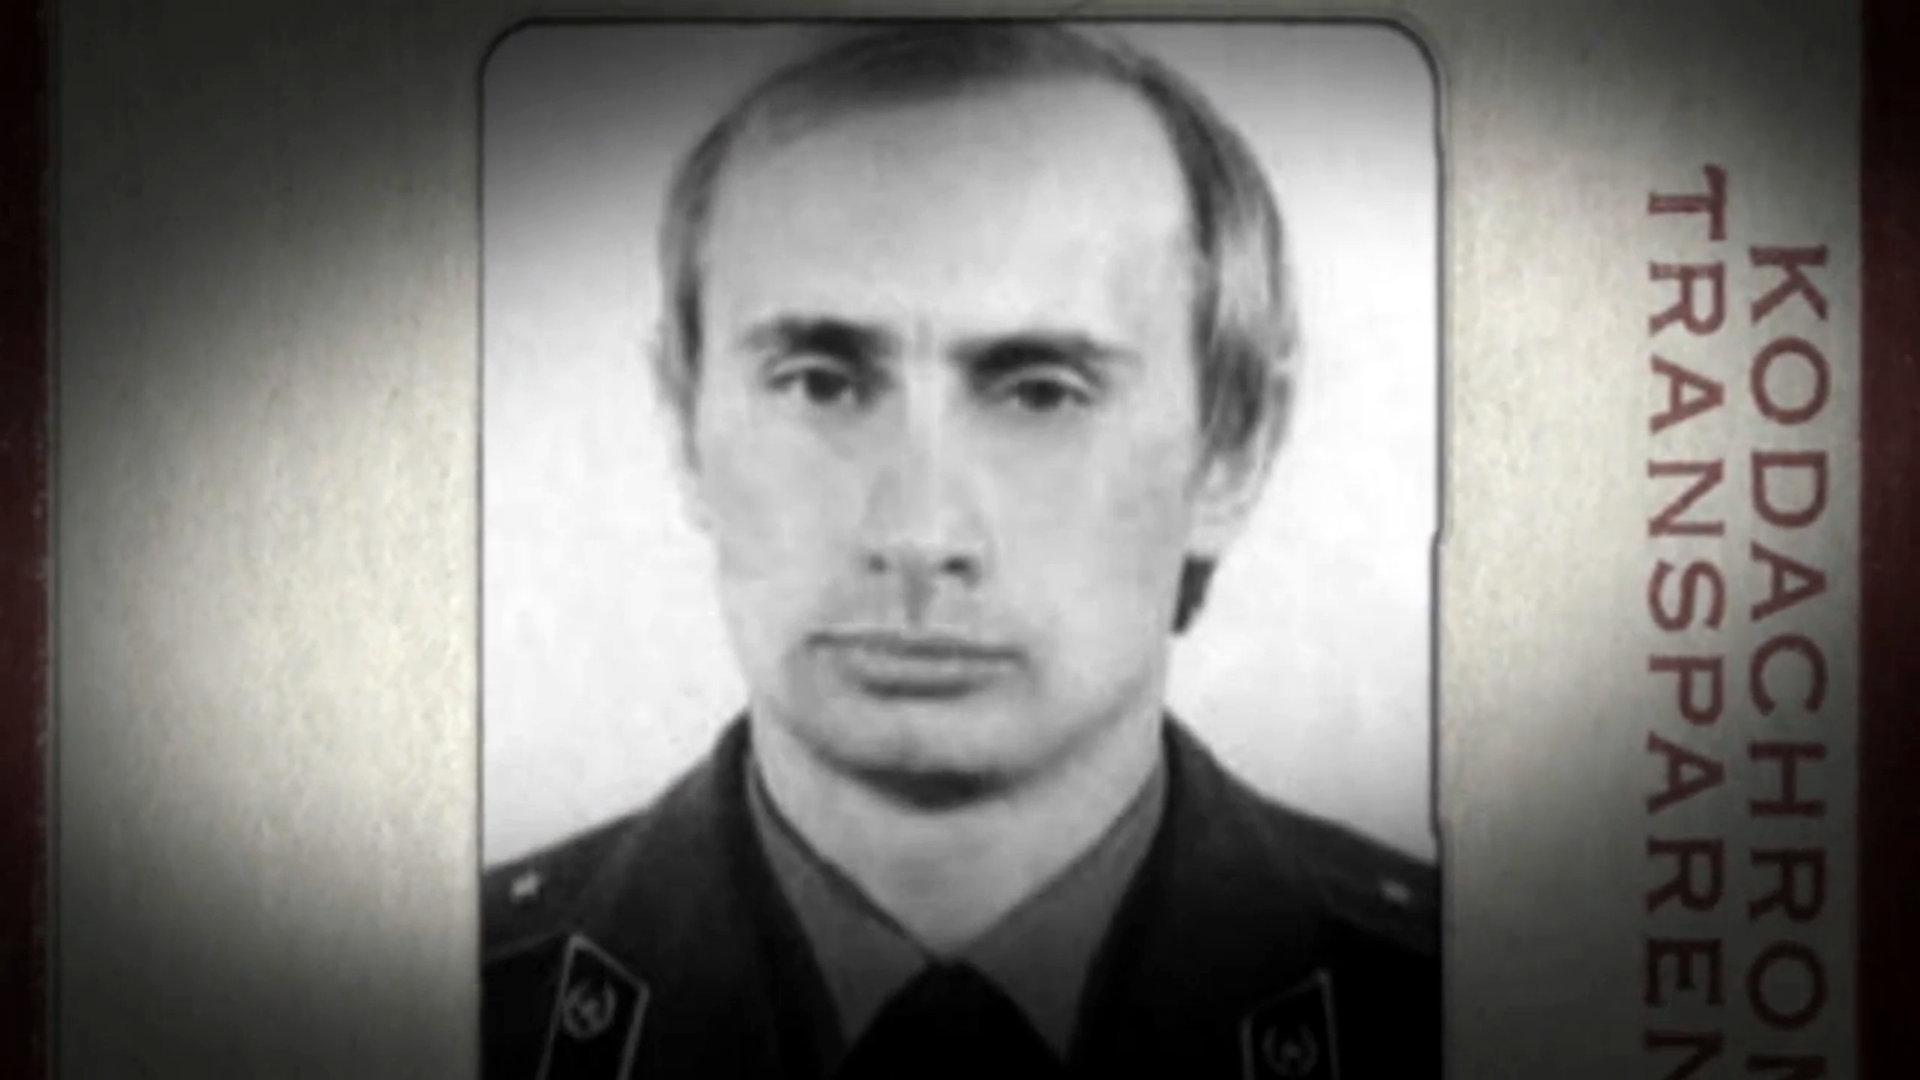 Putyin - frontline3 (putyin)